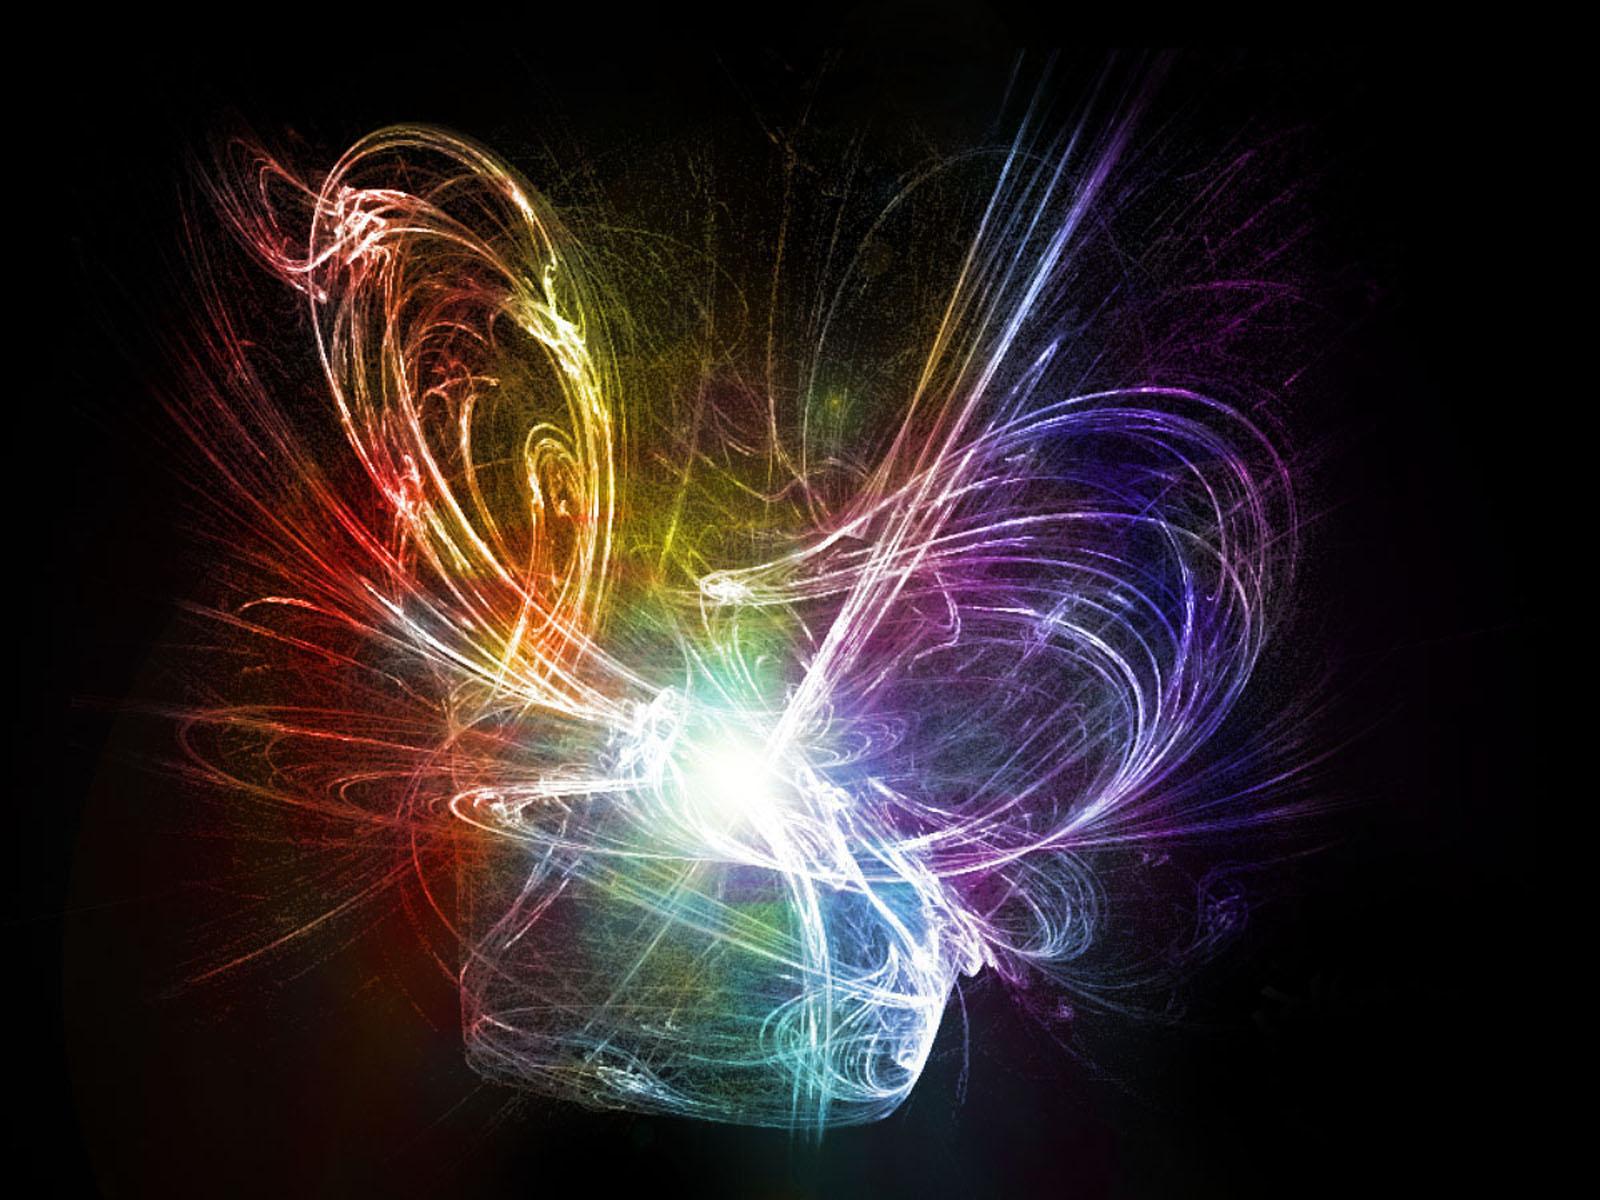 http://3.bp.blogspot.com/-tEgvrW_zFxA/T7euuFjuOdI/AAAAAAAADAQ/uhEWqiAN9D8/s1600/Abstract+Brush+Wallpapers+2.jpg